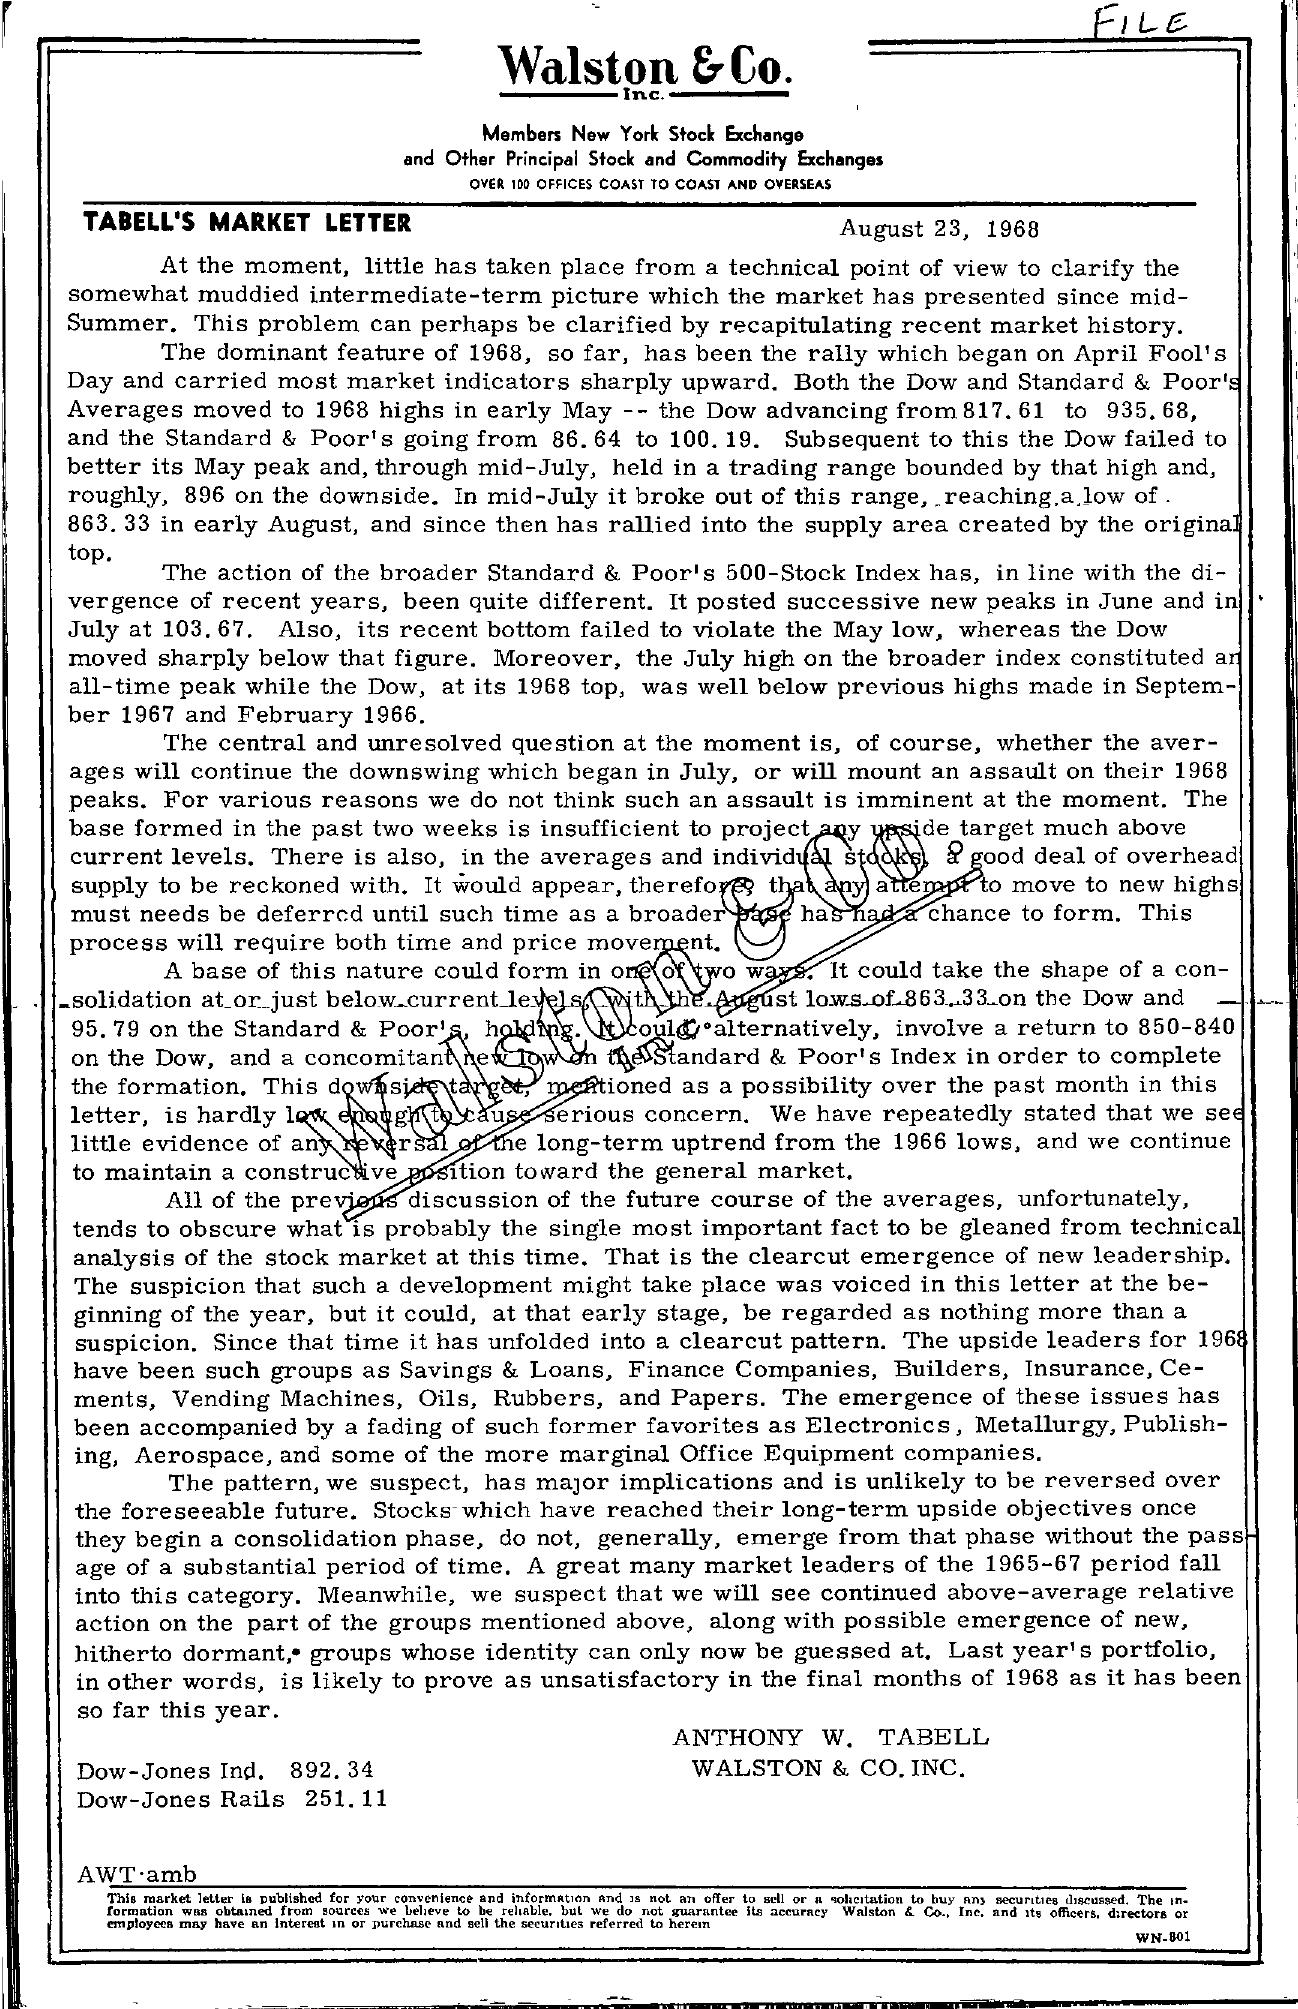 Tabell's Market Letter - August 23, 1968